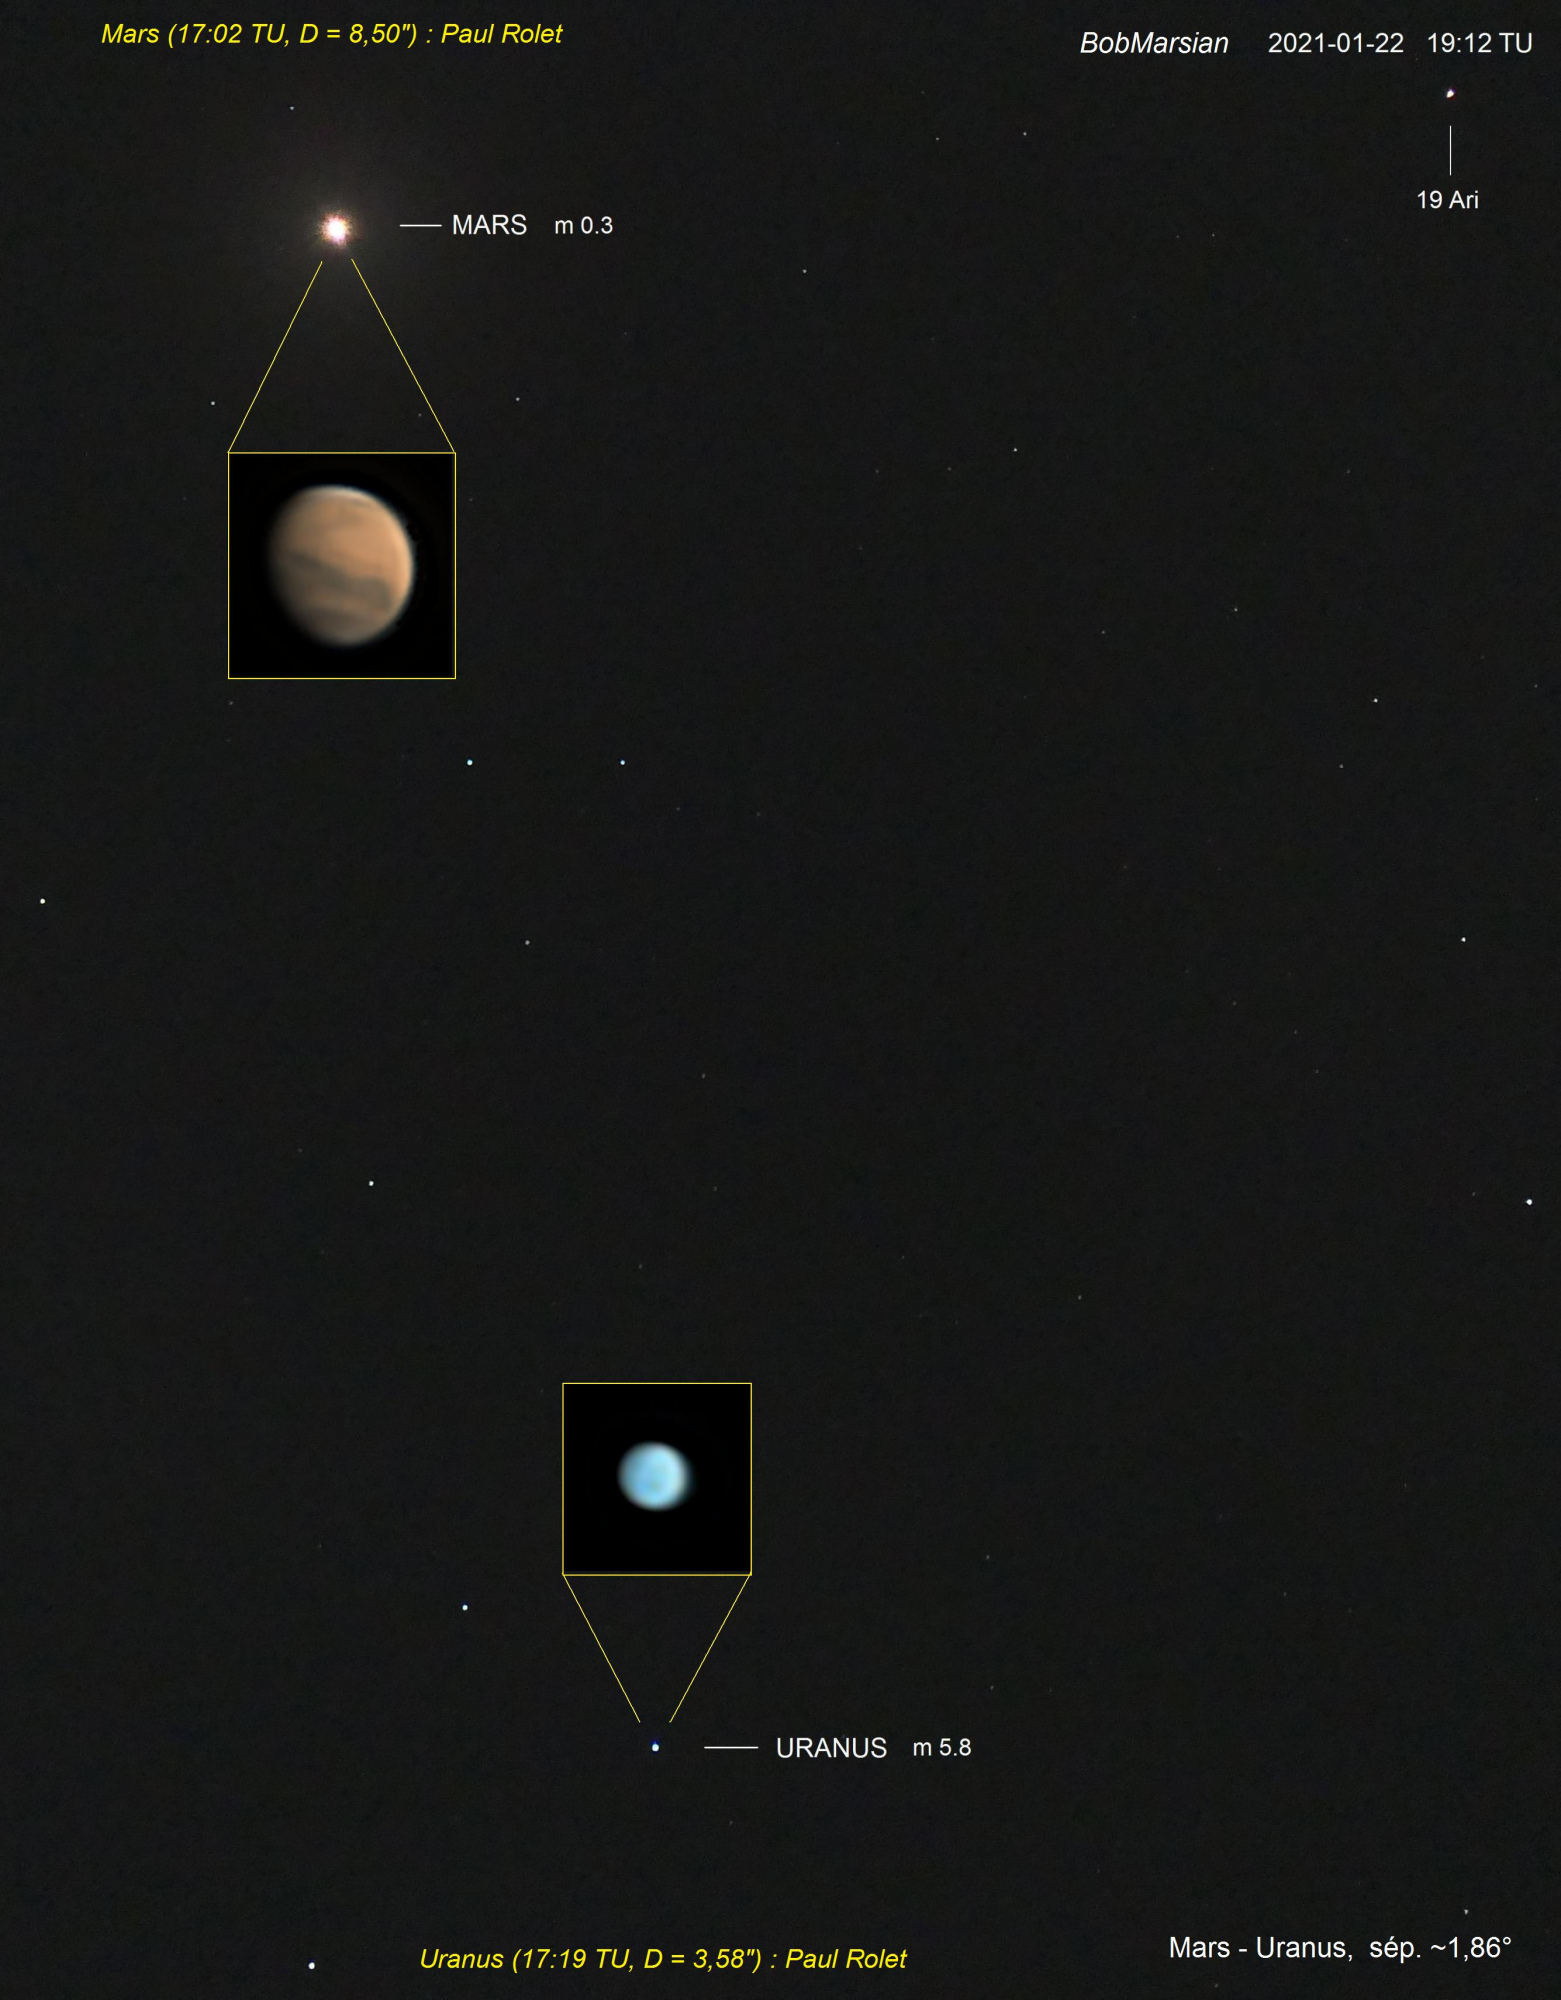 P1100642_Mars-Uranus_8.49-3.58_Bélier_ASF_mp.JPG